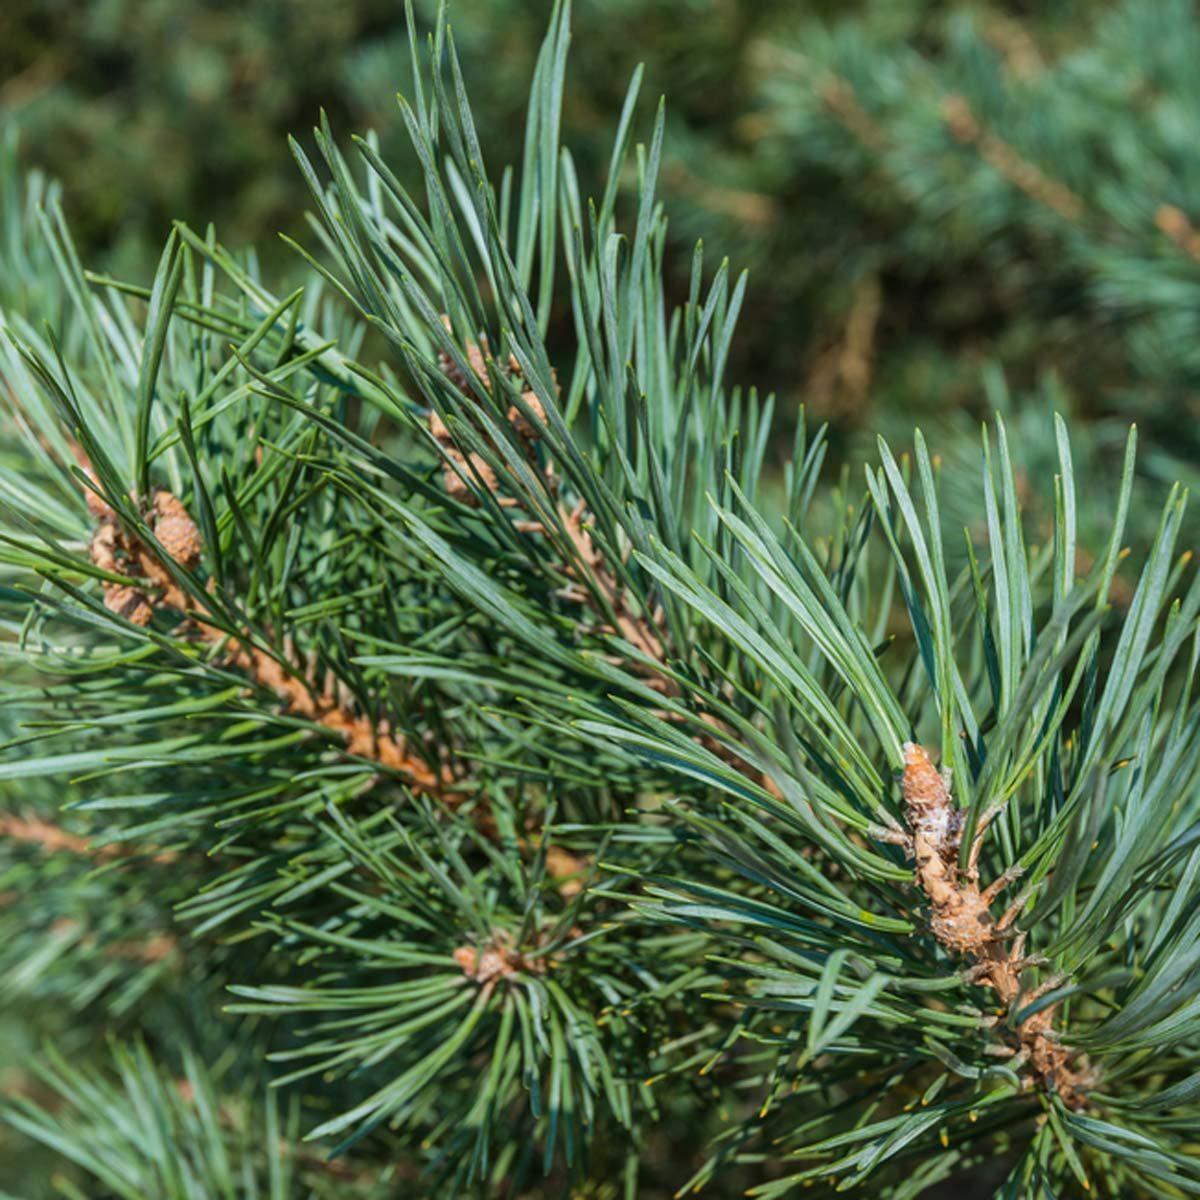 Scots or Scotch pine (Pinus sylvestris)